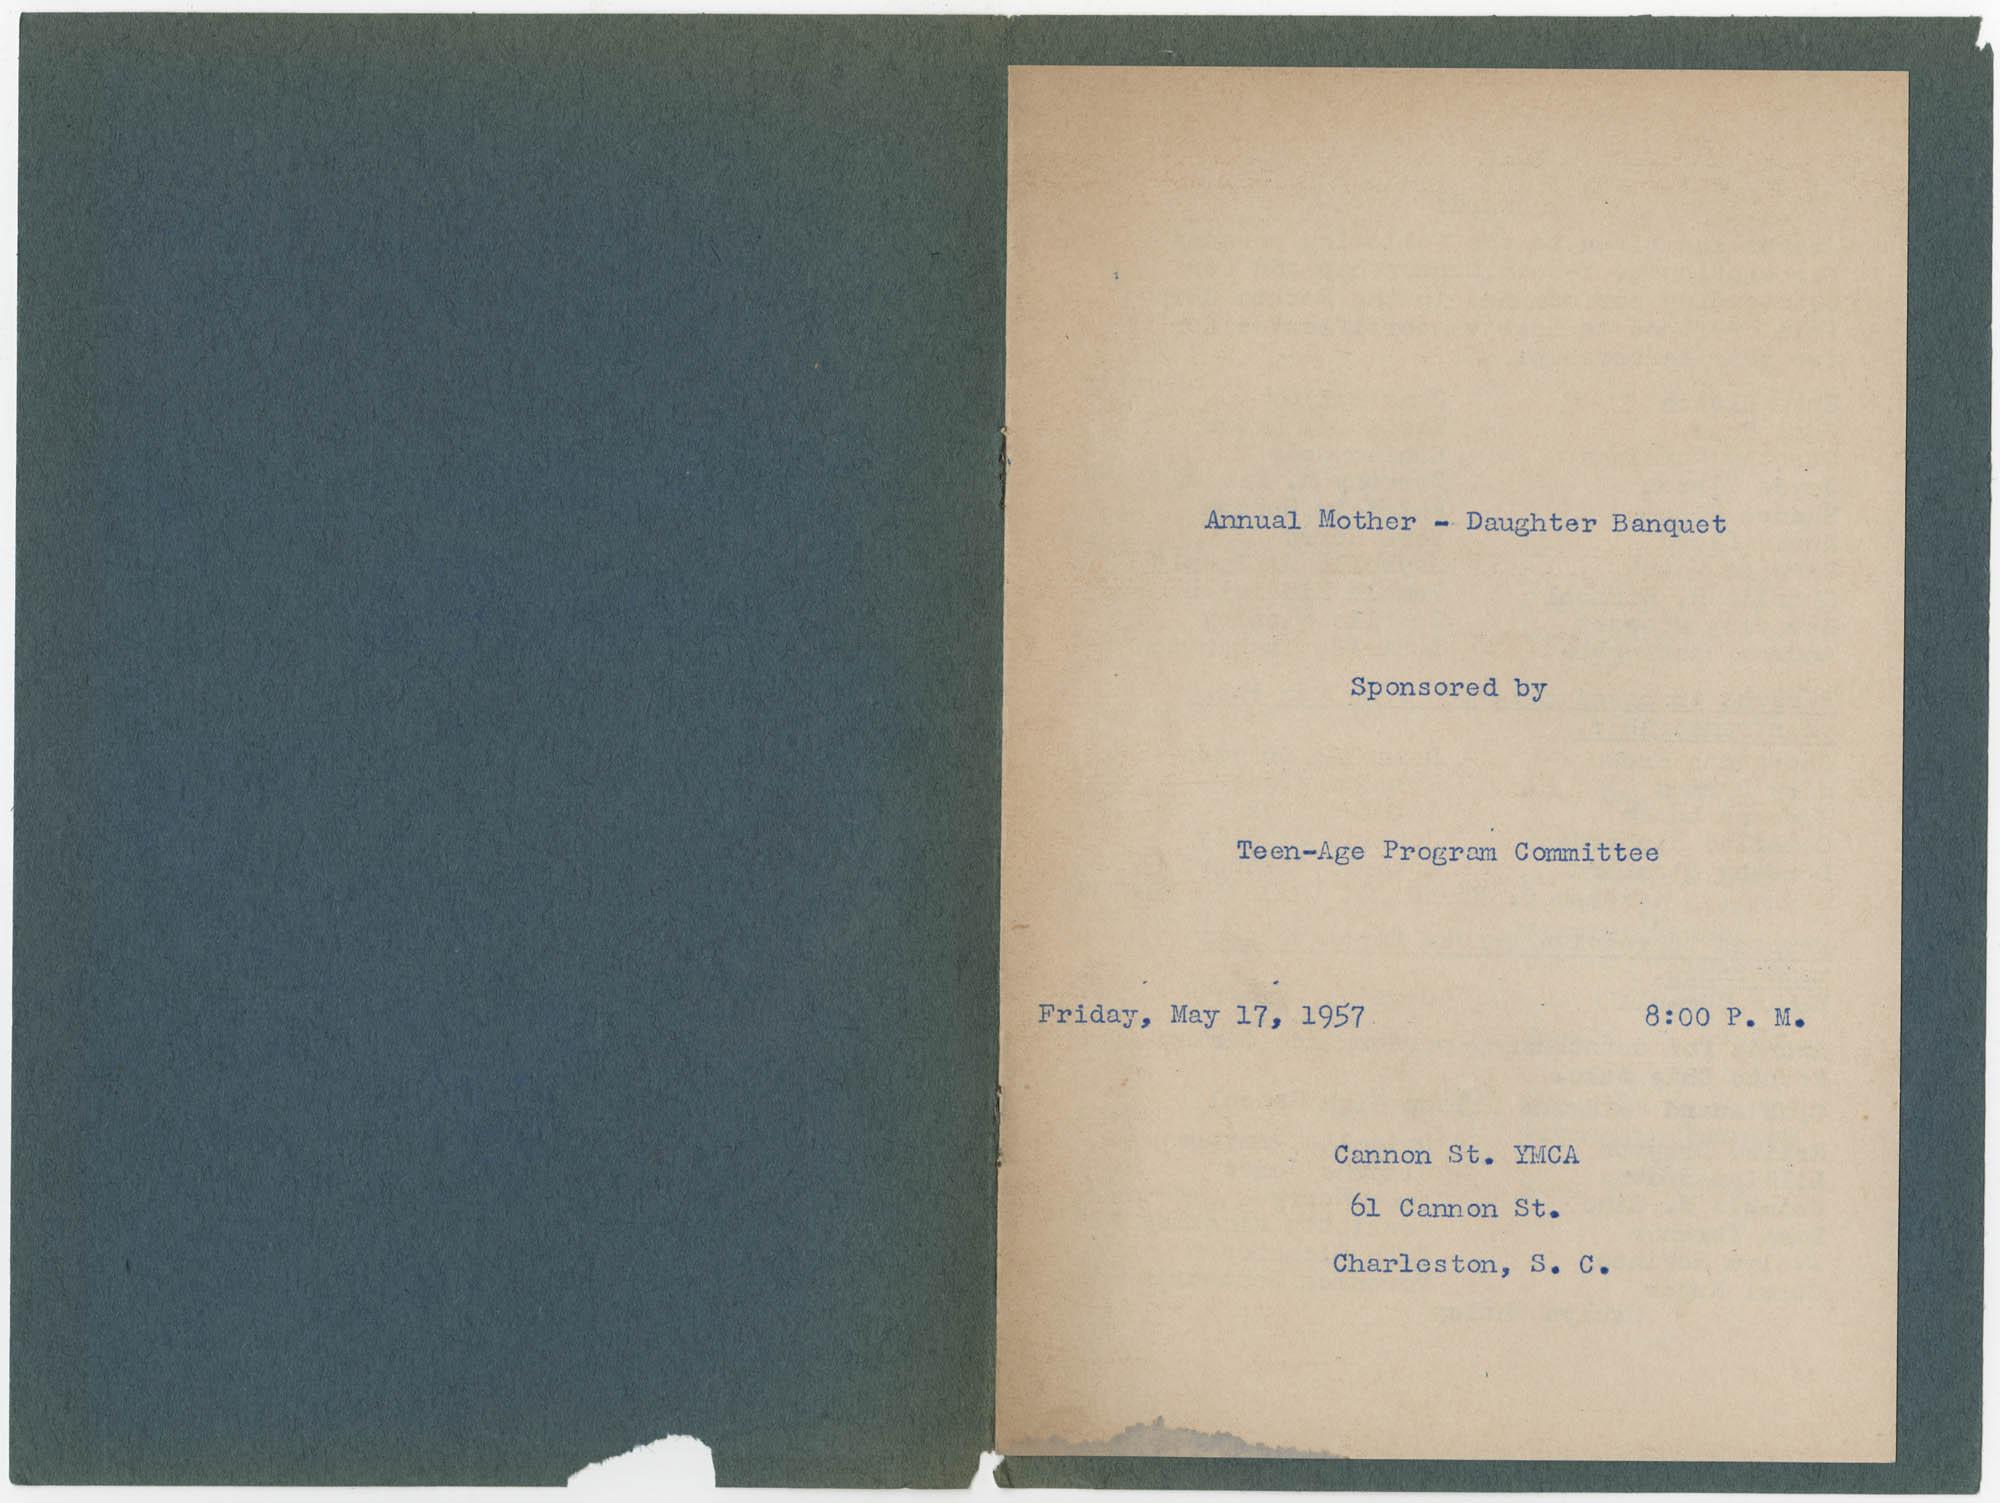 Coming Street Y.W.C.A. Scrapbook, 1953-1957, Page 135, Interior Page 1